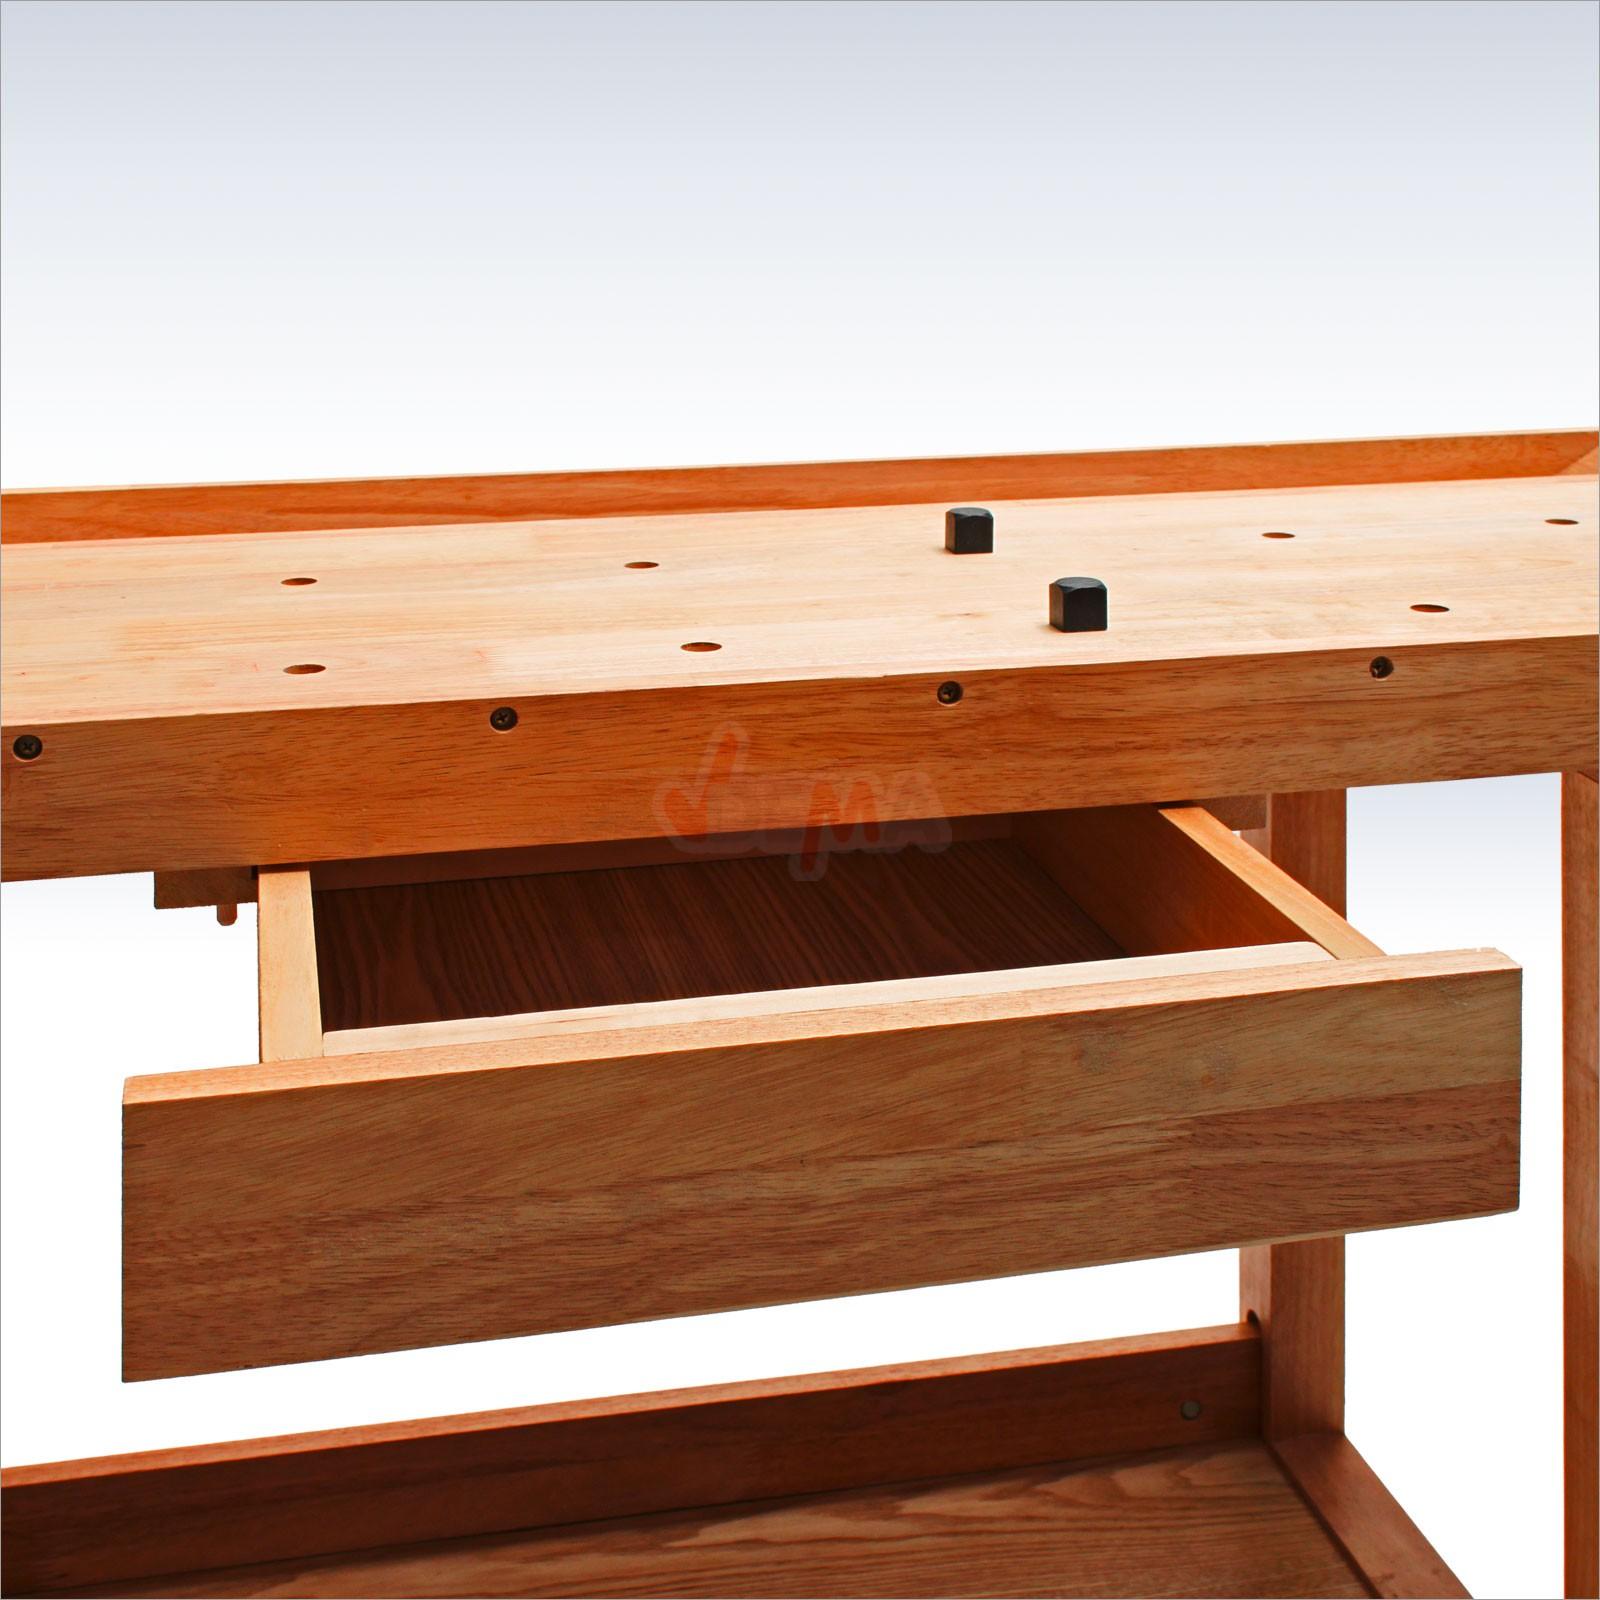 werkbank hobelbank holzwerkbank holz arbeitstisch werktisch 137x50x86 cm 20901. Black Bedroom Furniture Sets. Home Design Ideas